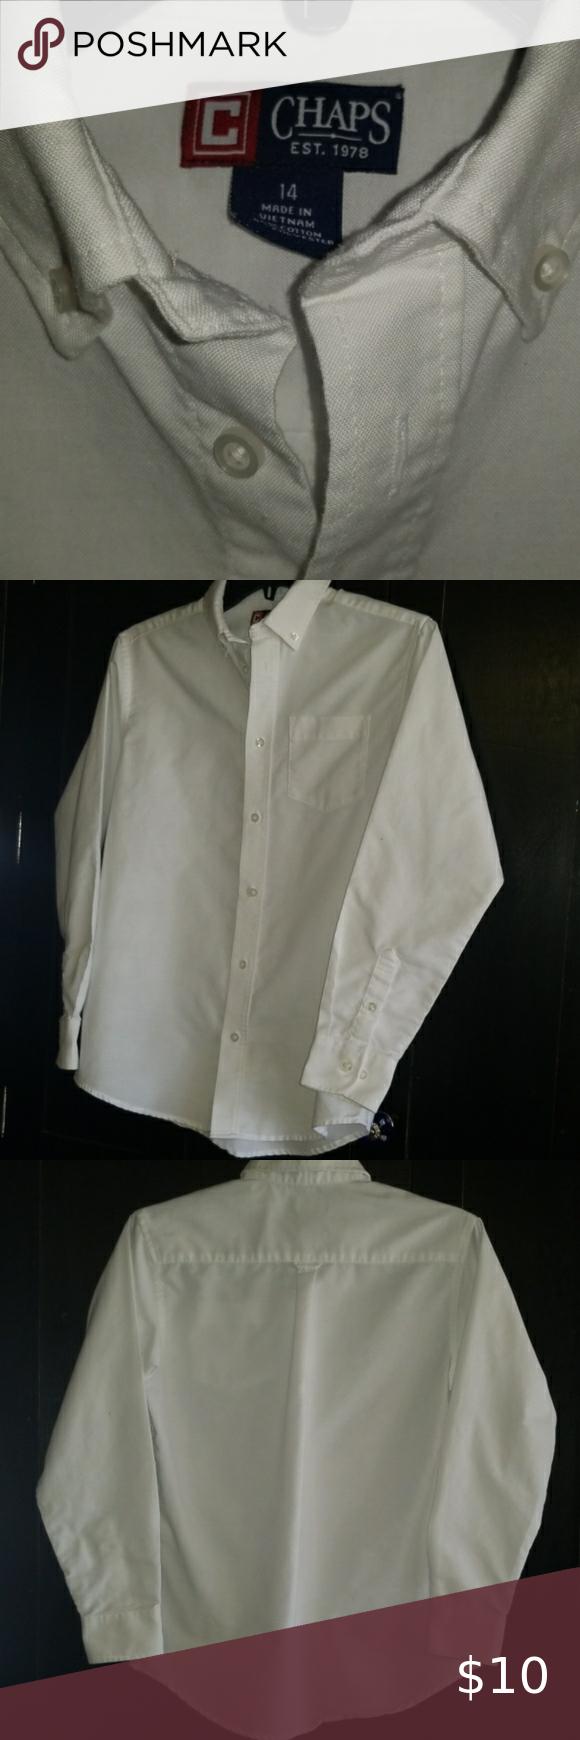 3 25 Boys 14 Chaps Long Sleeve Dress Shirt Boys Chaps White Long Sleeve Button Down Dress Shirt 55 Chaps Shirts Long Sleeve Shirt Dress White Long Sleeve [ 1740 x 580 Pixel ]